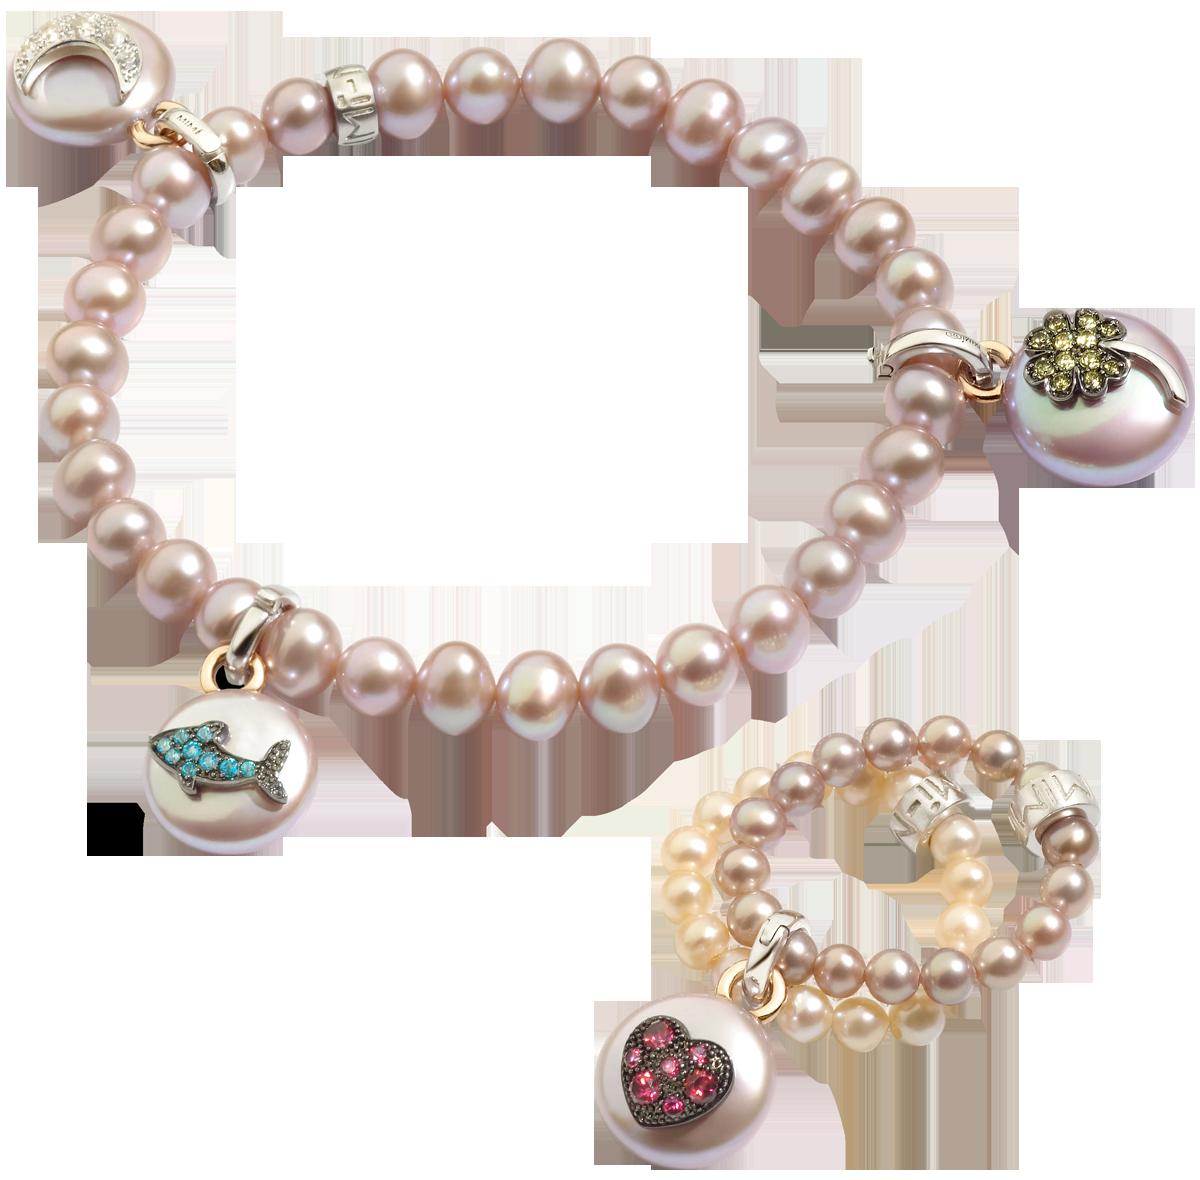 Mimi - Les Lulu - amuletos